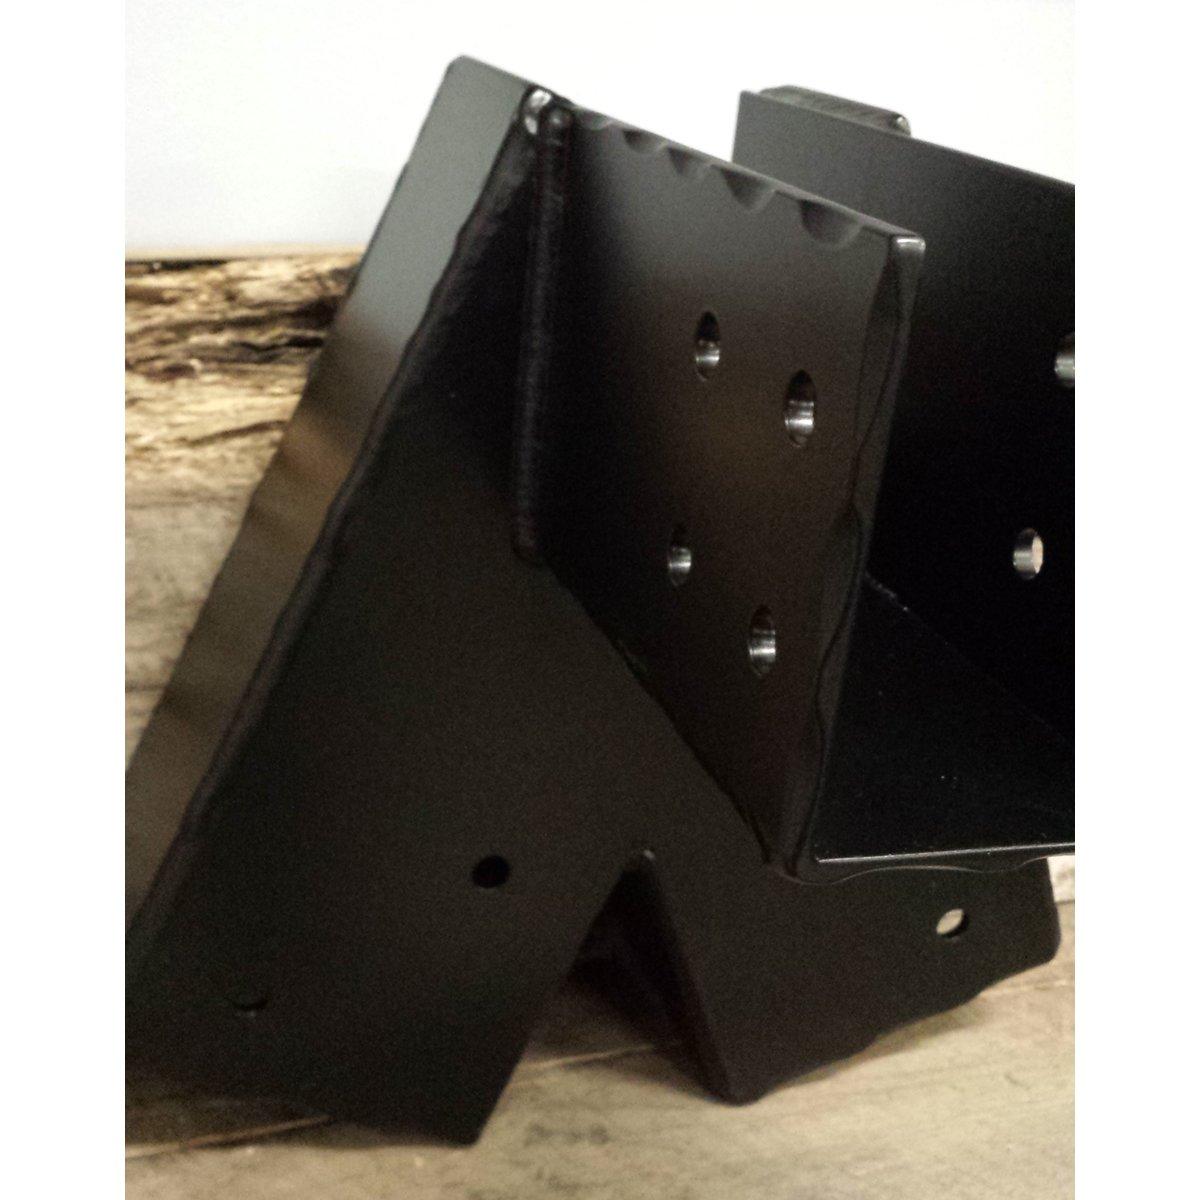 Custom Steel Swing Set Brackets Hammered and Powder Coated Black